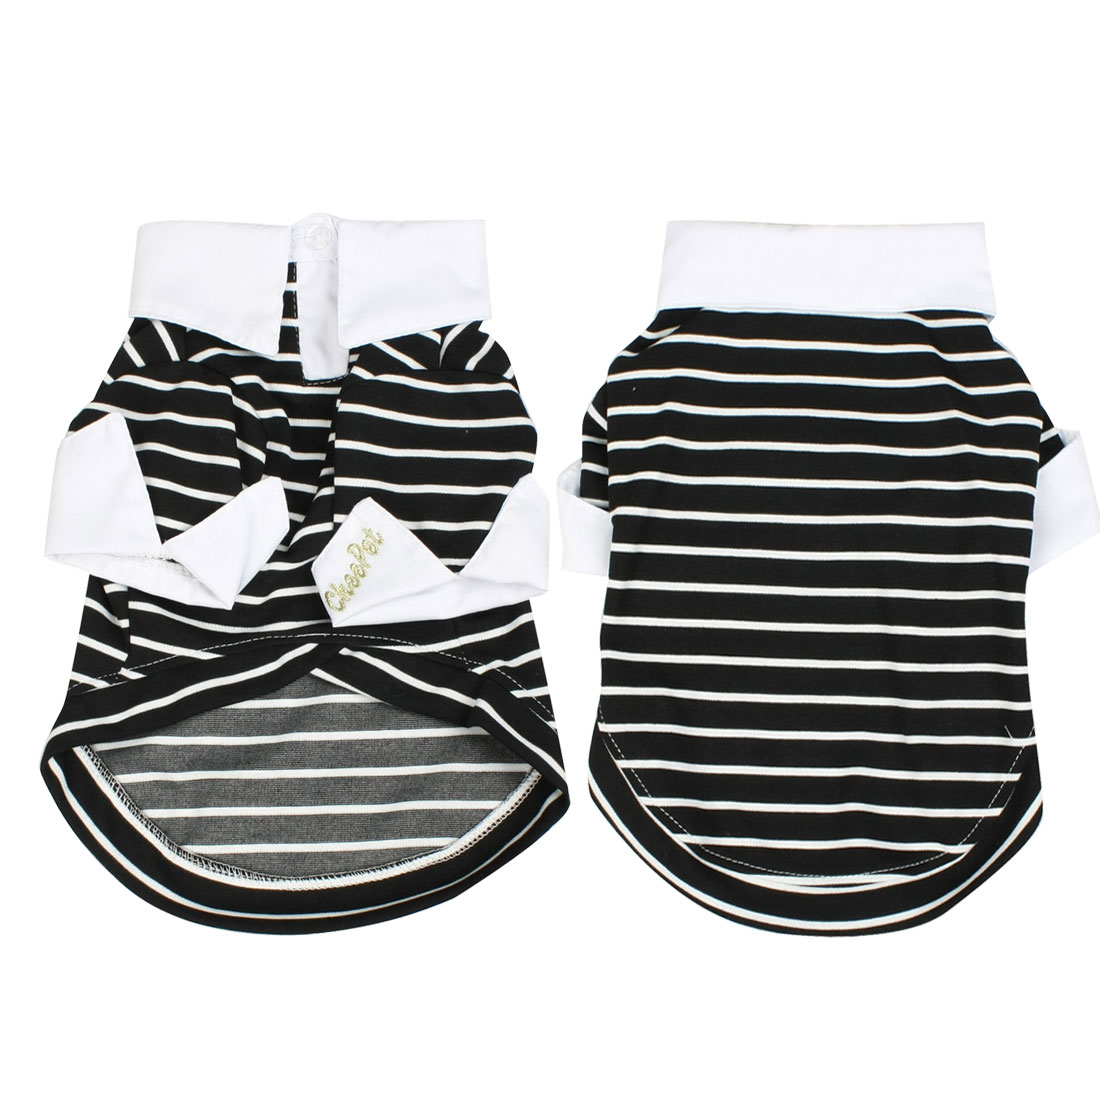 Black White Striped Shih Tzu Pet Dog Shirt Top Apparel Clothing L